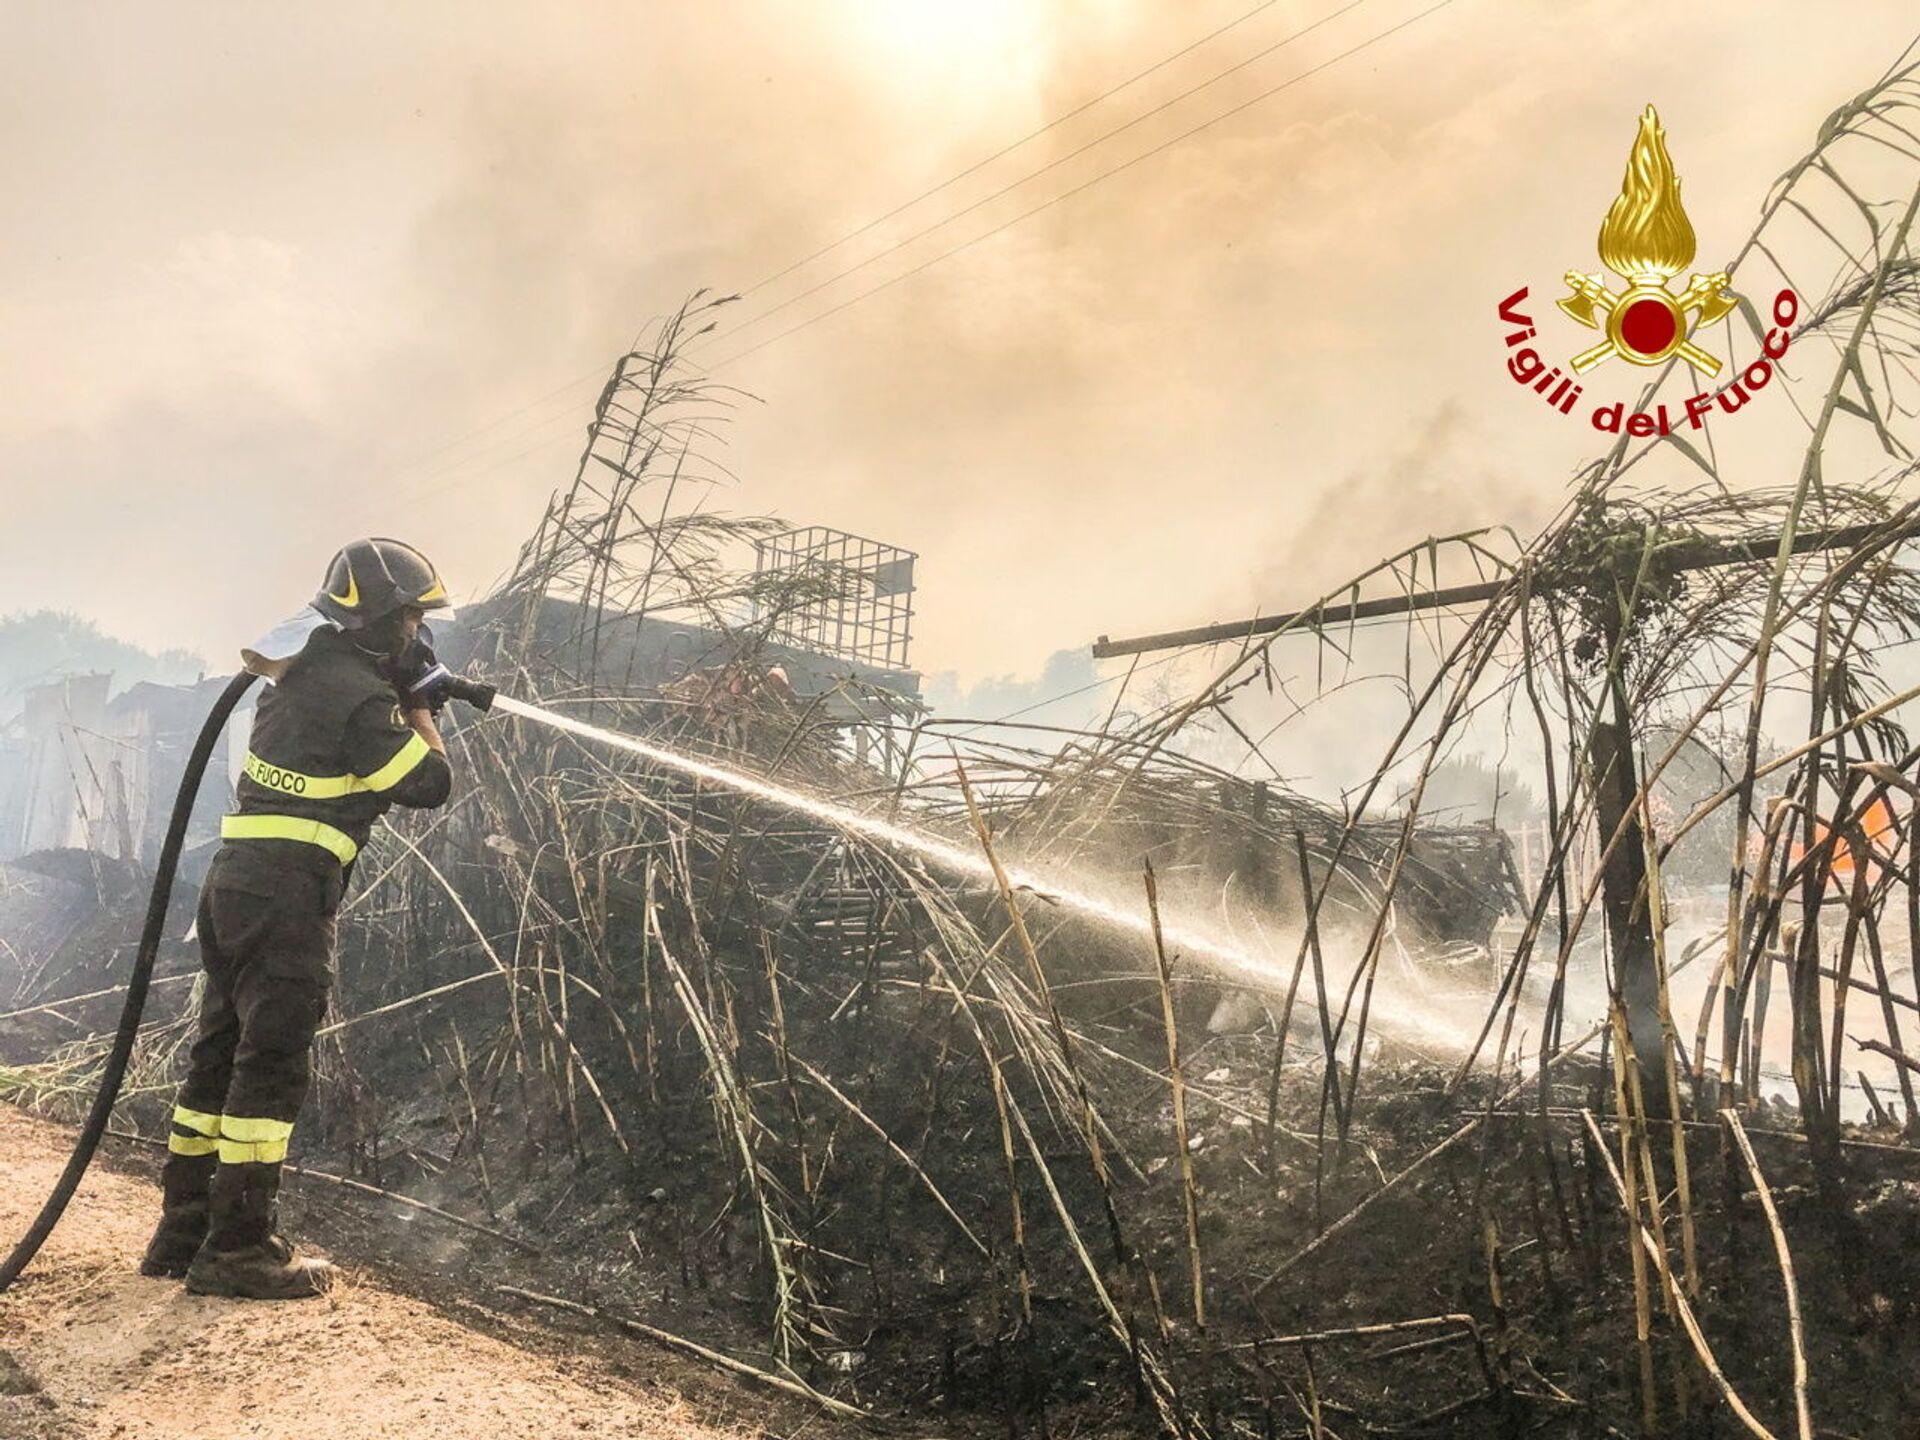 A firefighter battles the flames after a large wildfire broke out near Santu Lussurgiu, Sardinia, Italy July 24, 2021. - Sputnik International, 1920, 07.09.2021